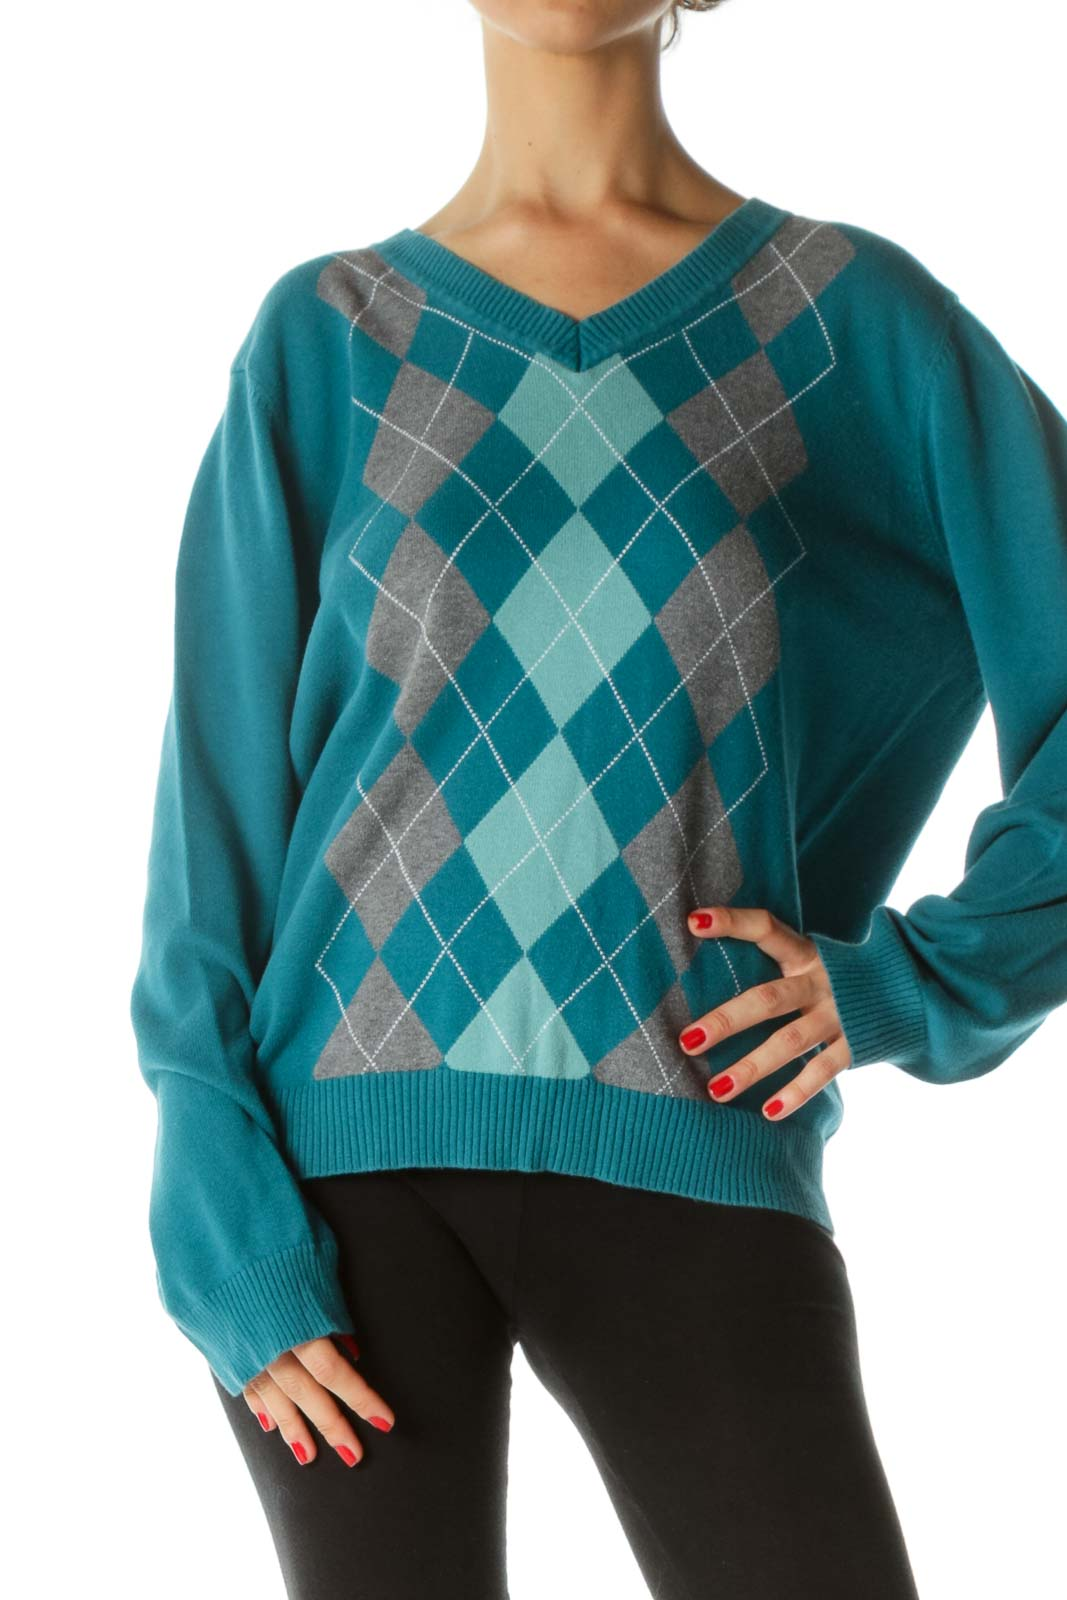 Blue Gray White 100% Cotton Argyle V-Neck Sweater Front